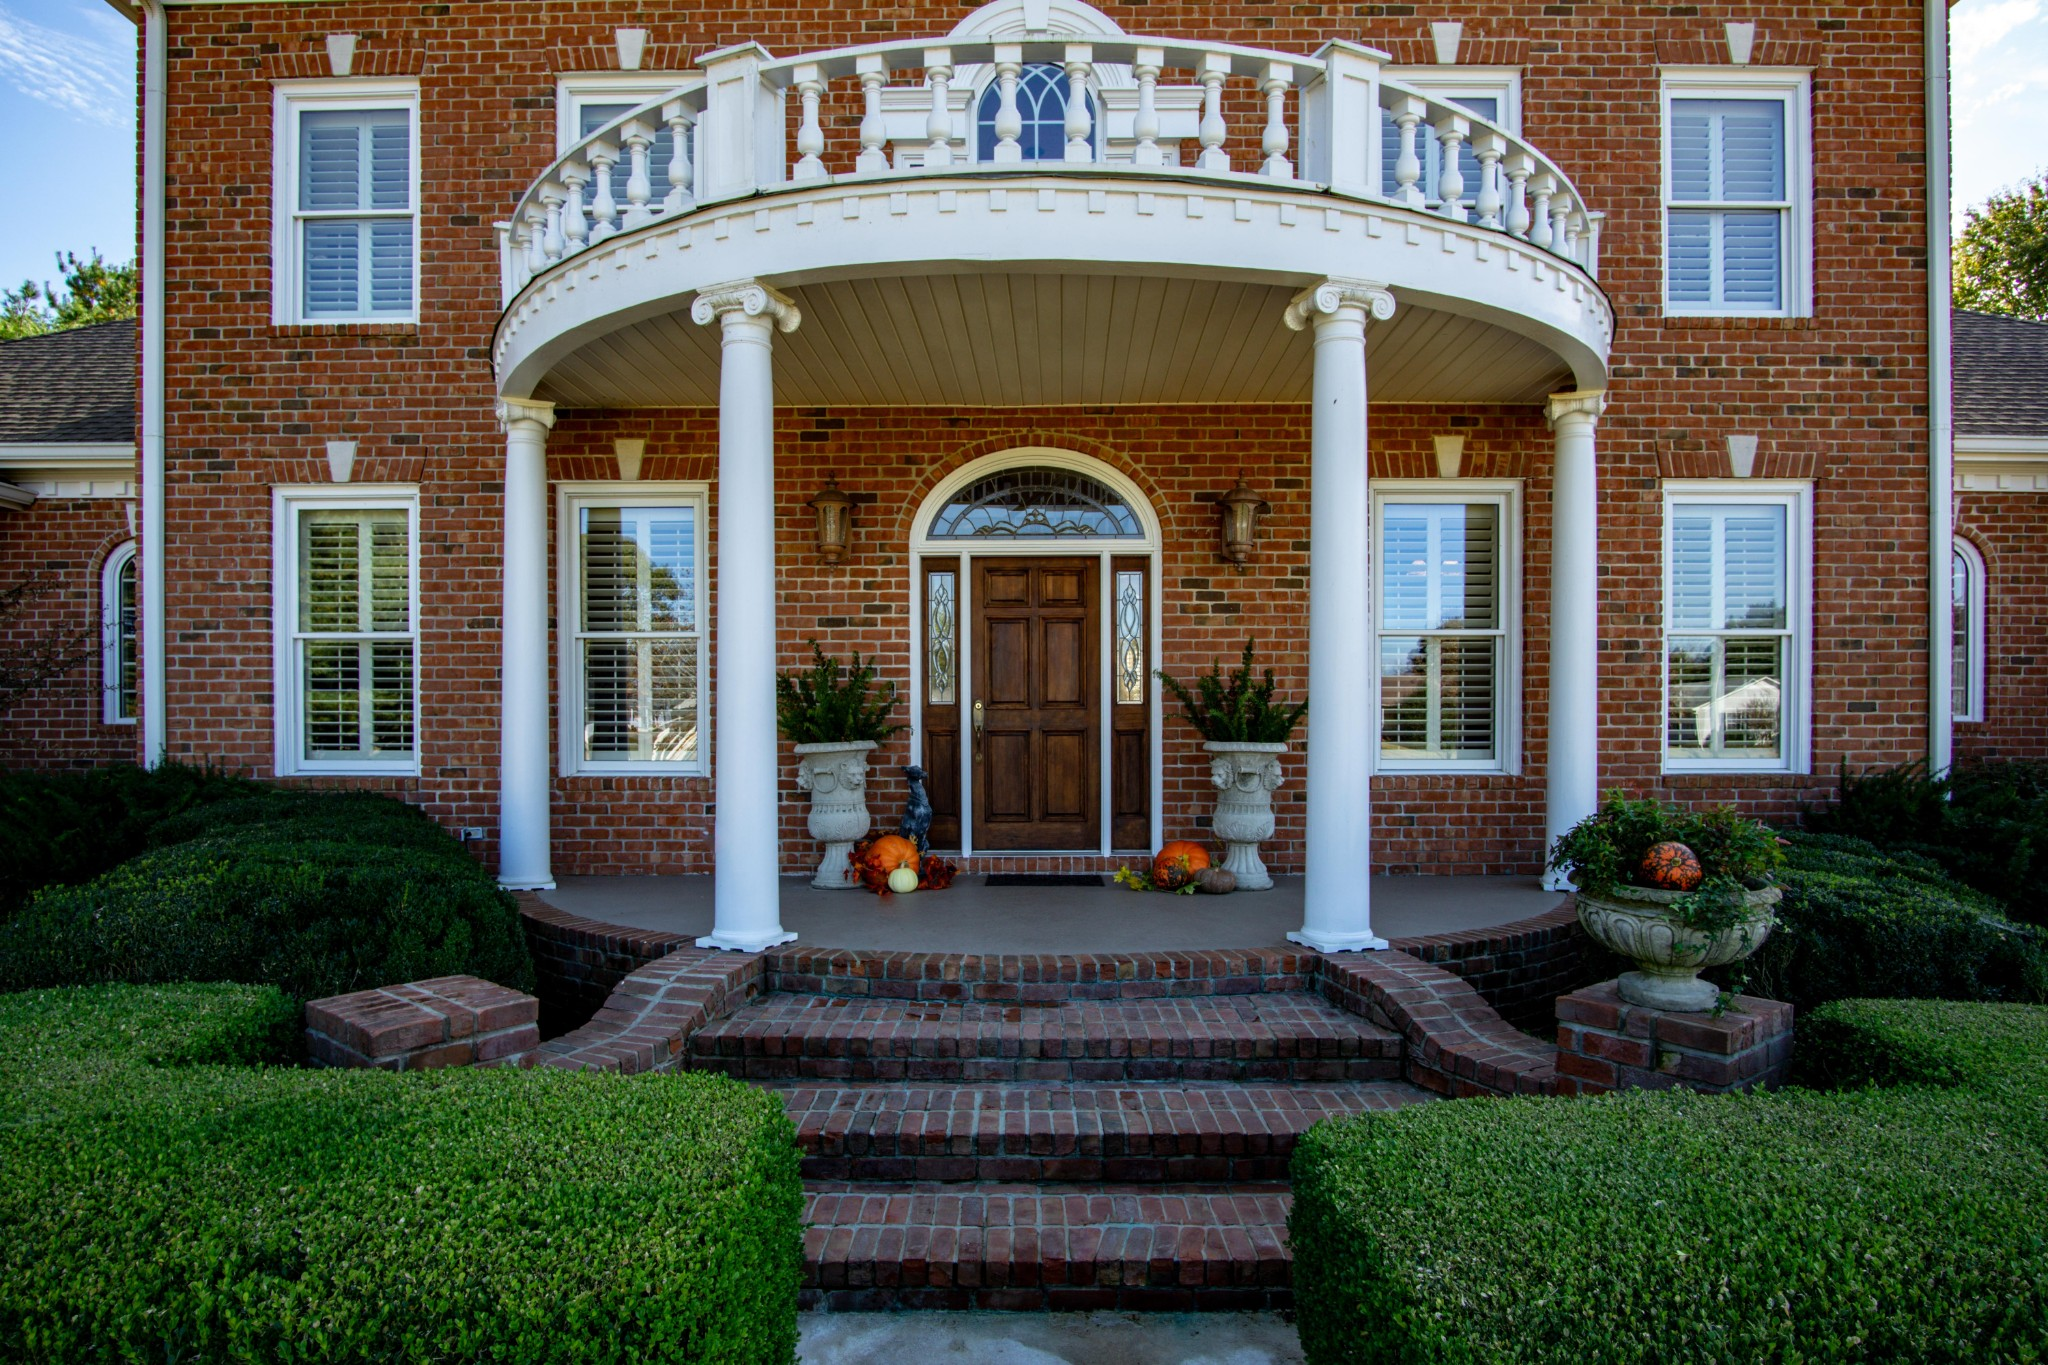 911 9Th St, Lawrenceburg, TN 38464 - Lawrenceburg, TN real estate listing